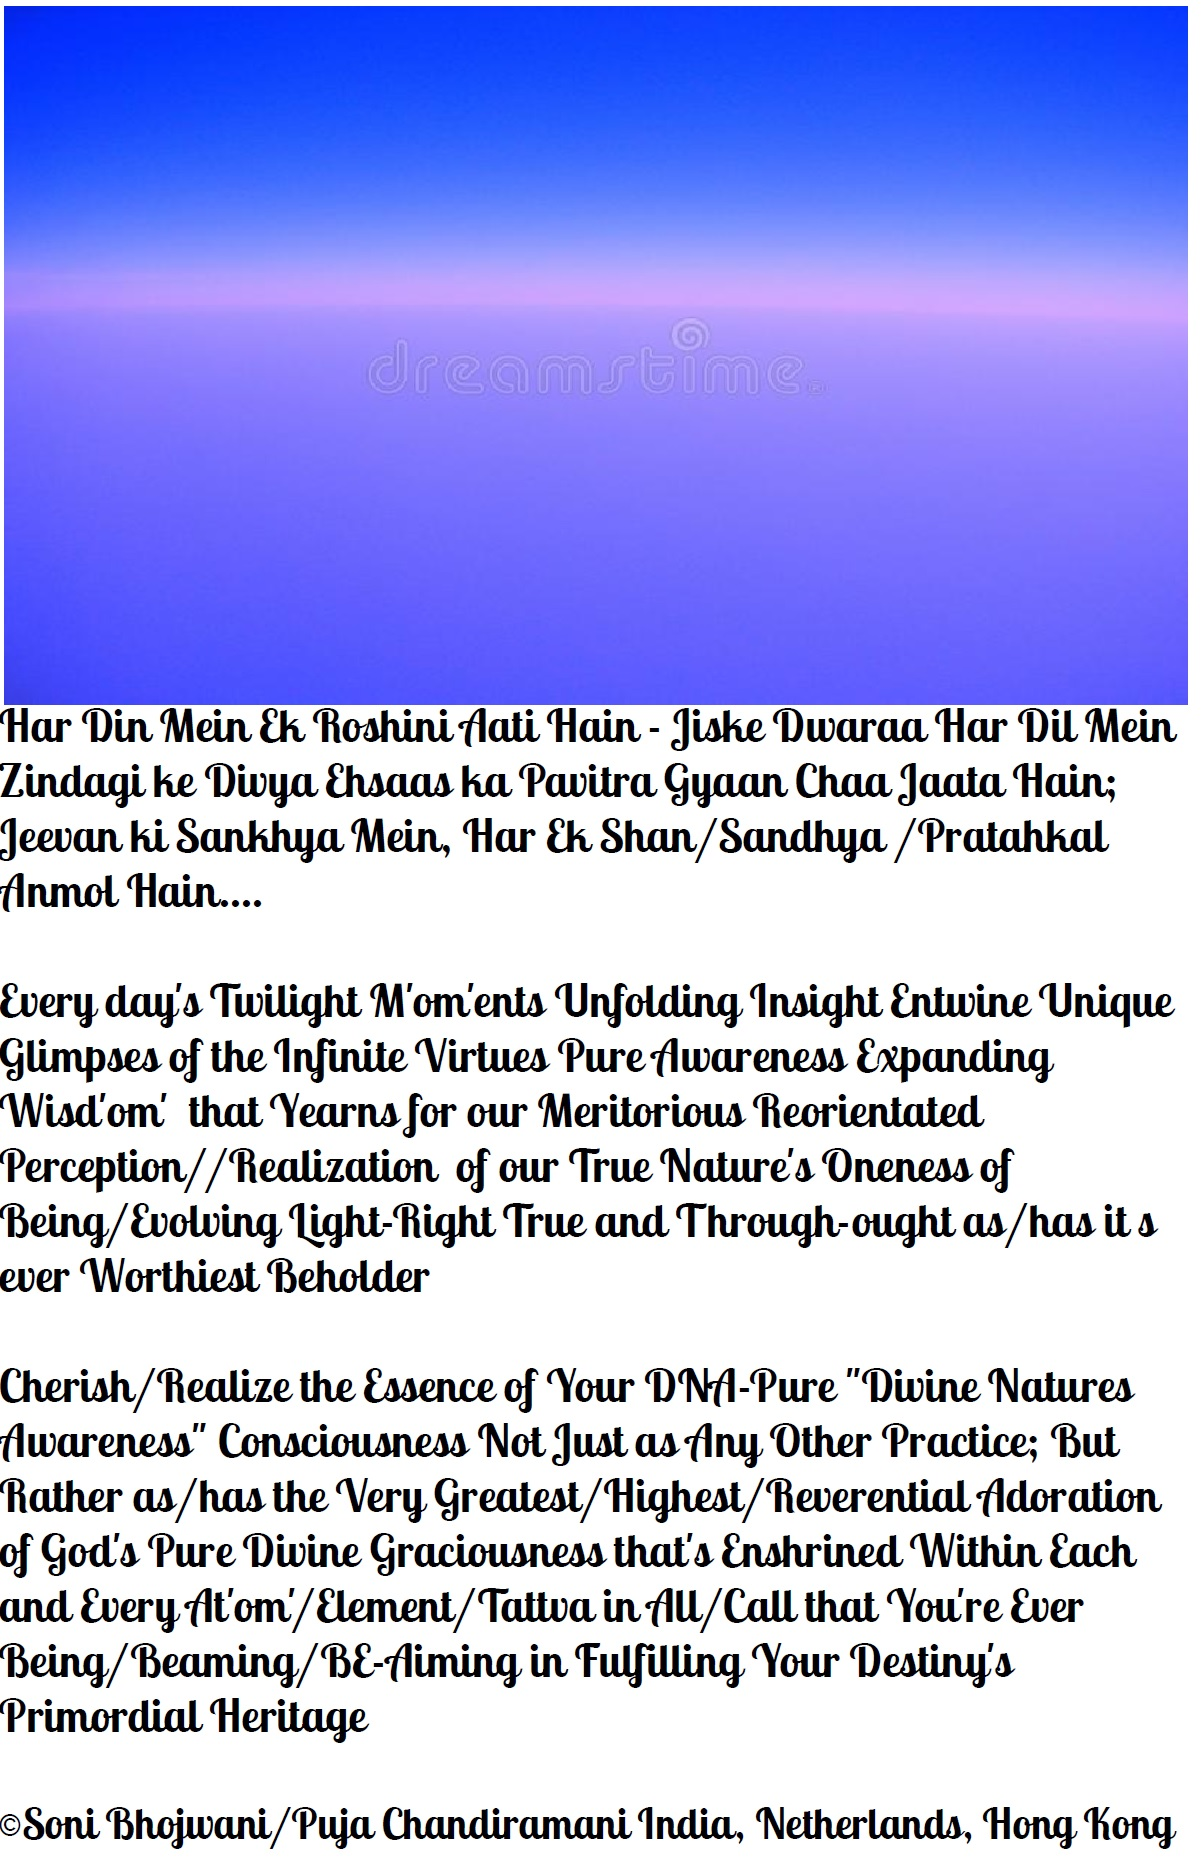 https://i0.wp.com/shivashaktibhava.files.wordpress.com/2018/07/dna-divine-nature-awareness.jpg?ssl=1&w=450